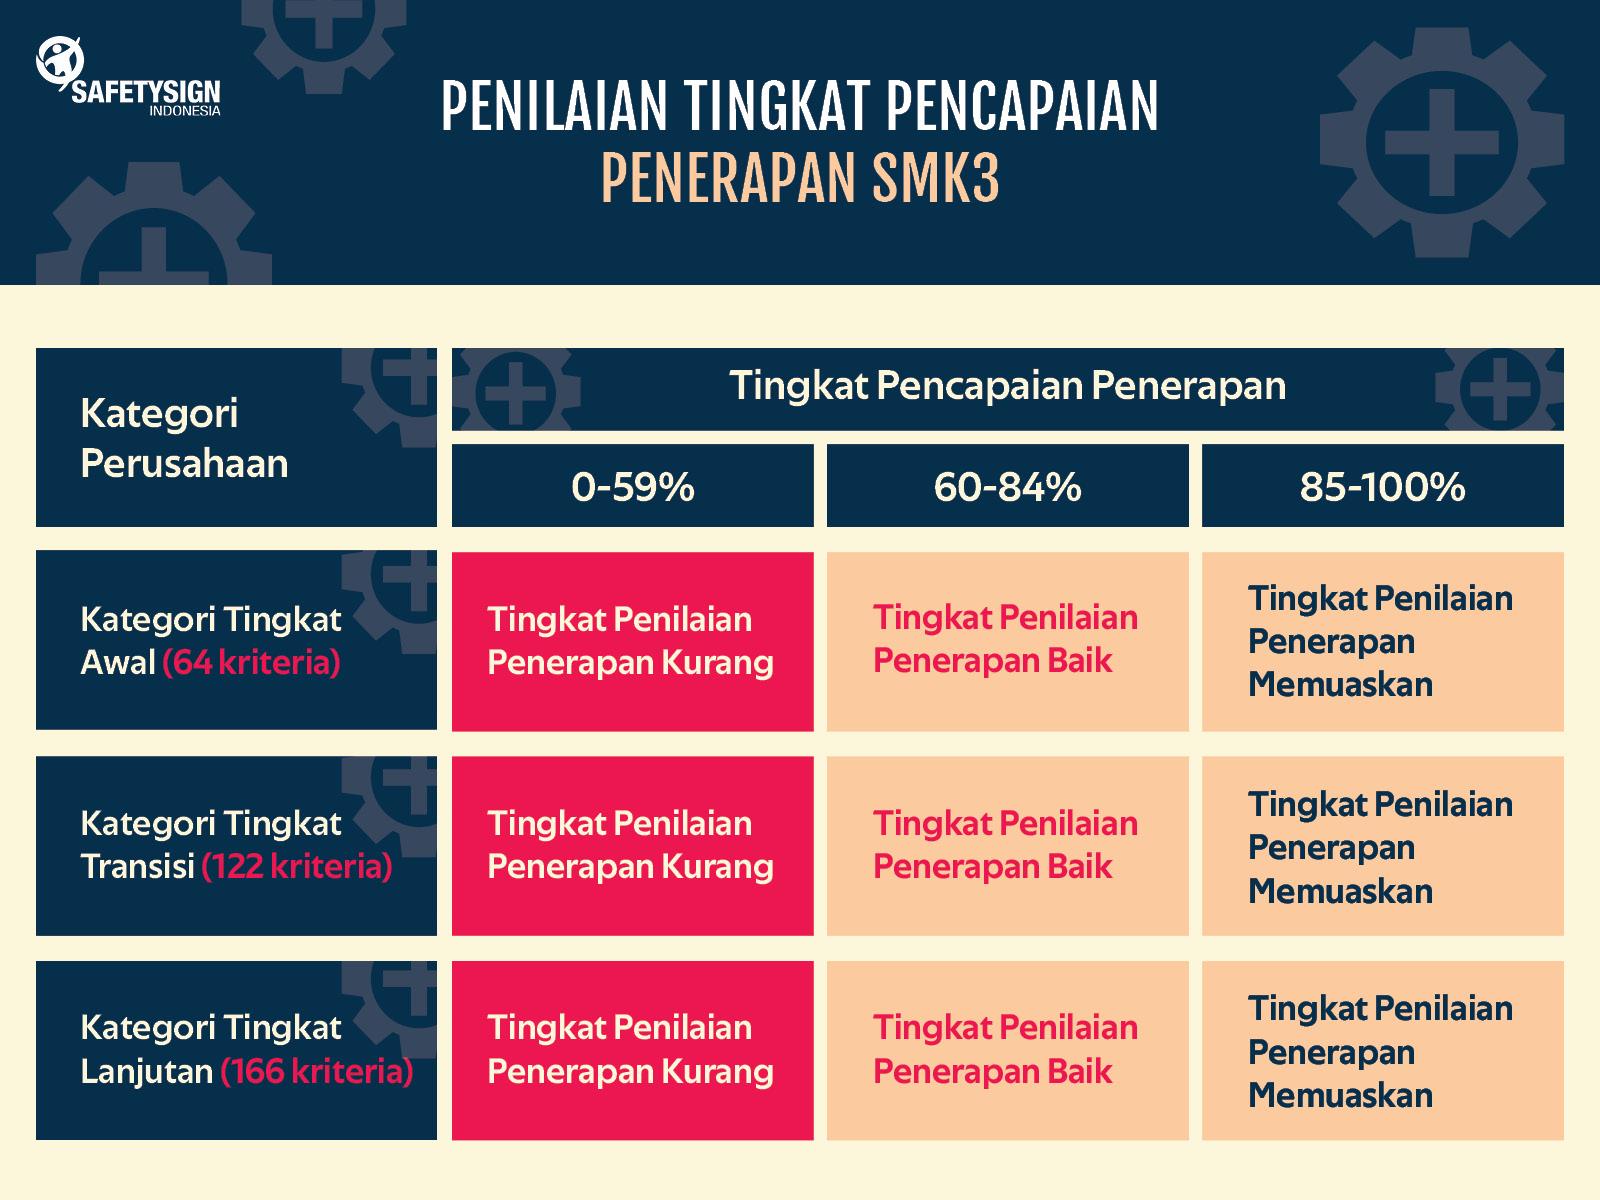 4 Poin Penting Audit Eksternal Smk3 Bagaimana Menurut Regulasi Safety Sign Indonesia